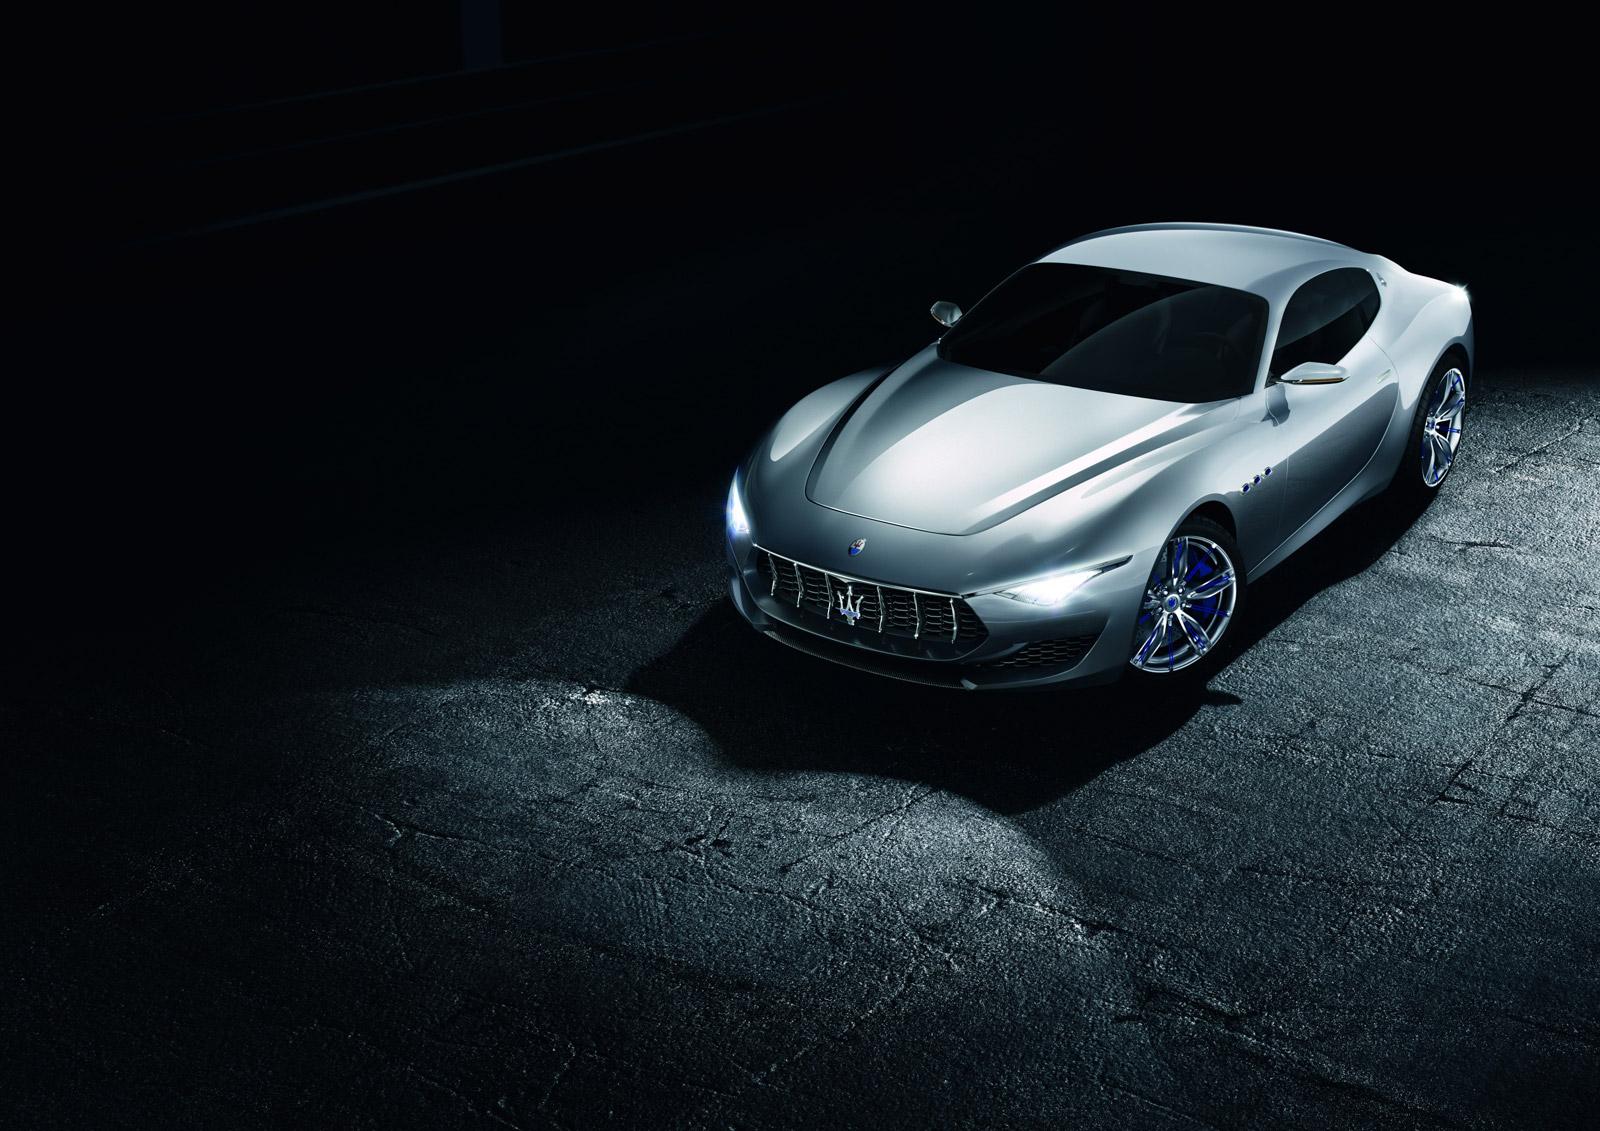 Report: Maserati Alfieri sports car delayed